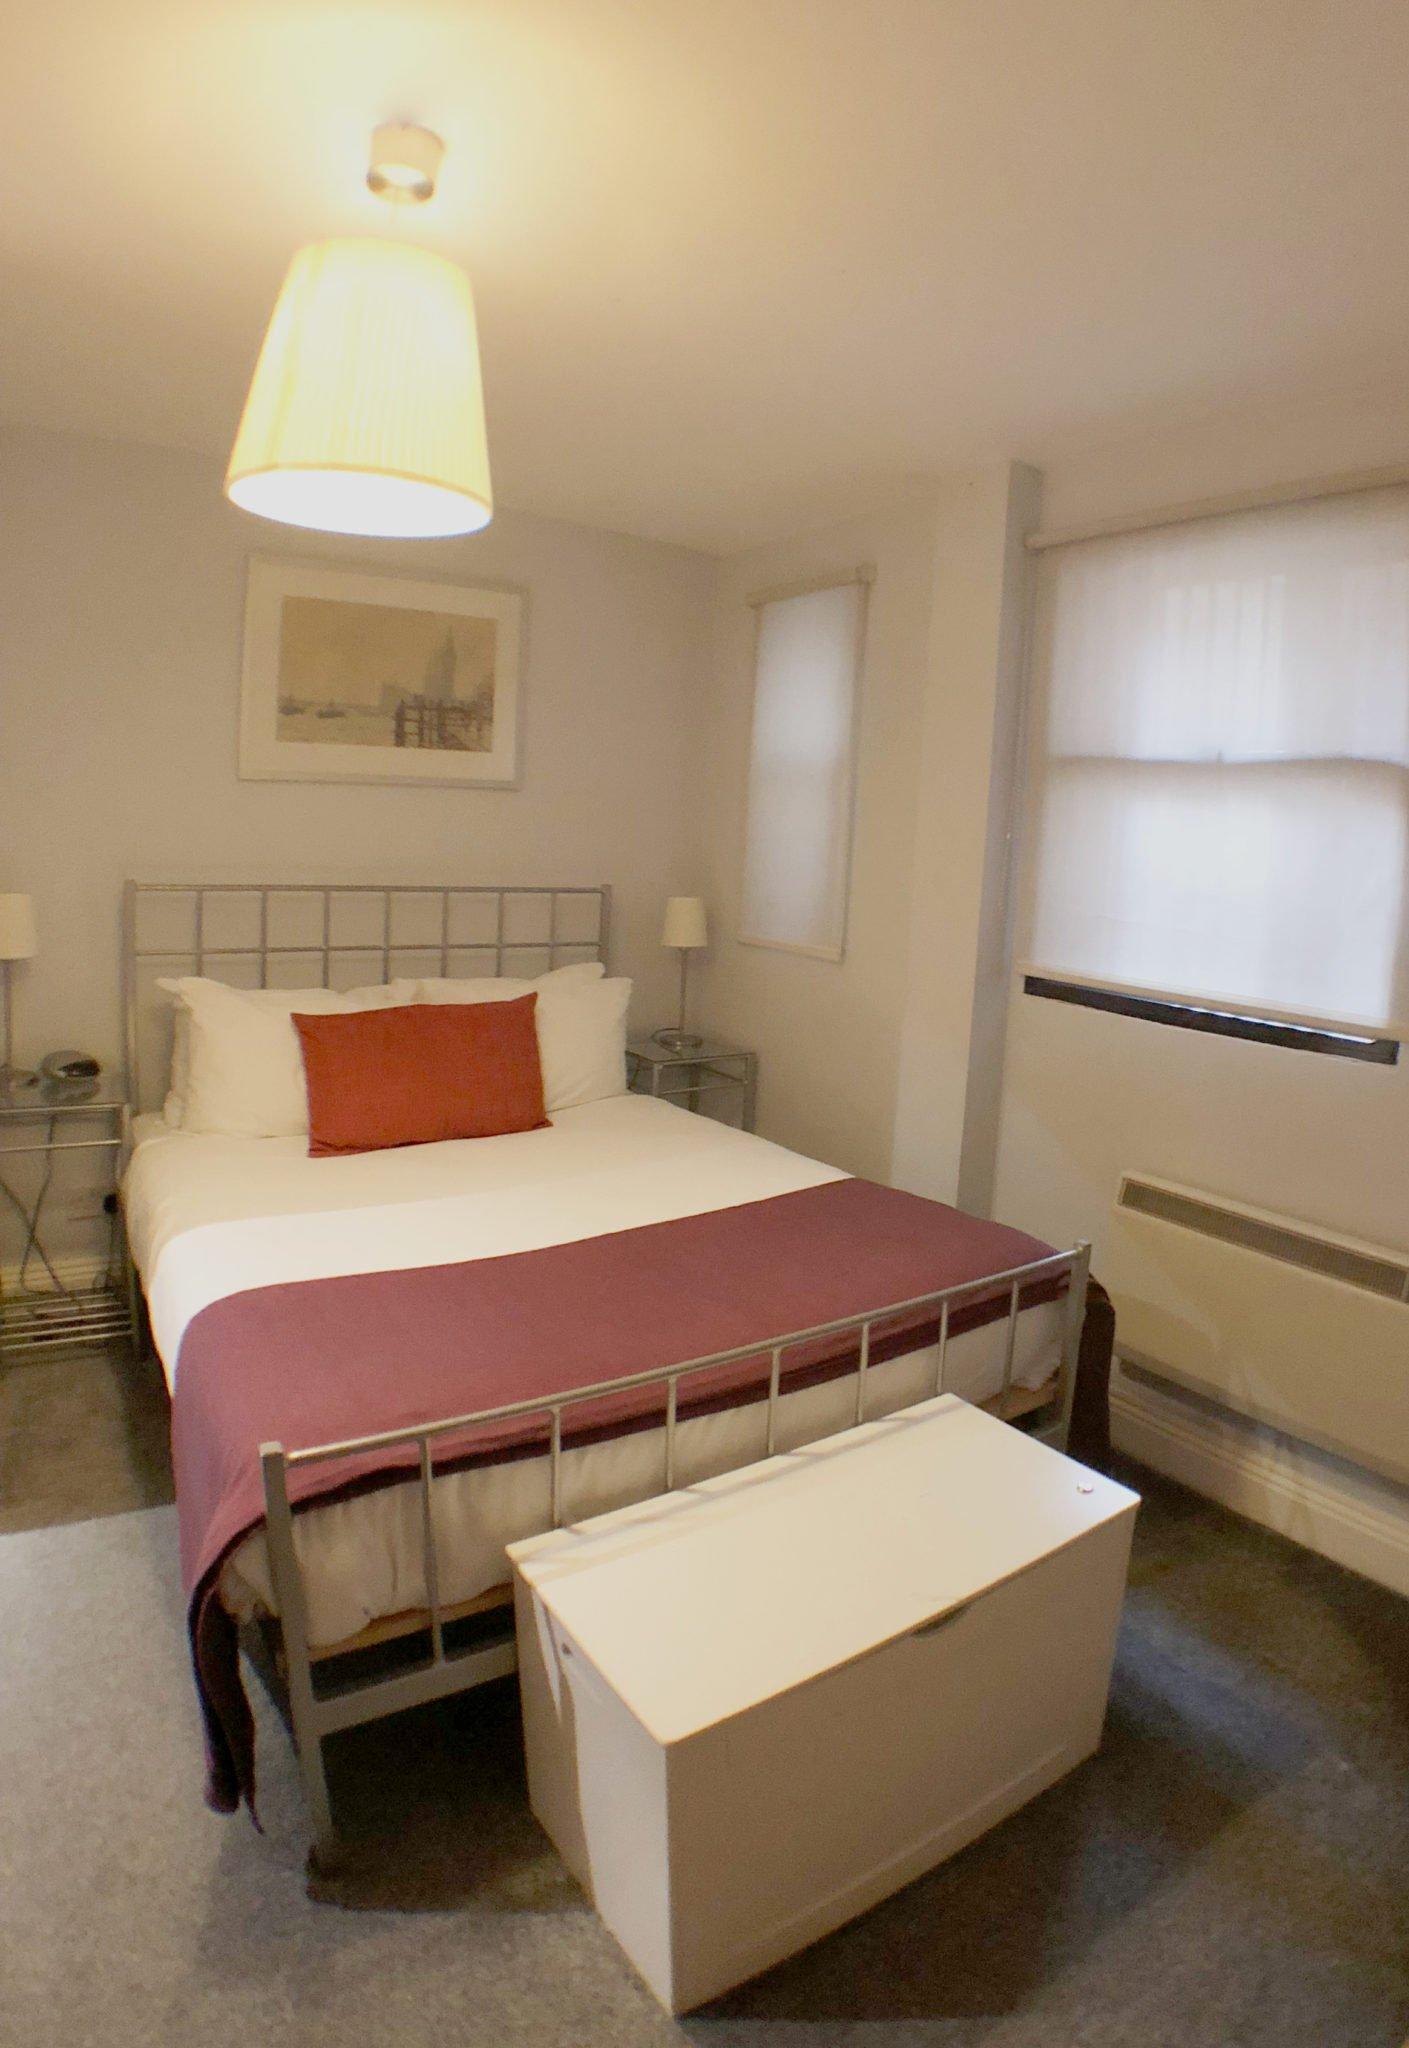 Monument-Serviced-Apartments-London---Corporate-Short-Stay-Accommodation-near-London-Bridge,-Bank-&-Monument!-Relocation-&-Insurance-Accommodation-London-|-Urban-Stay